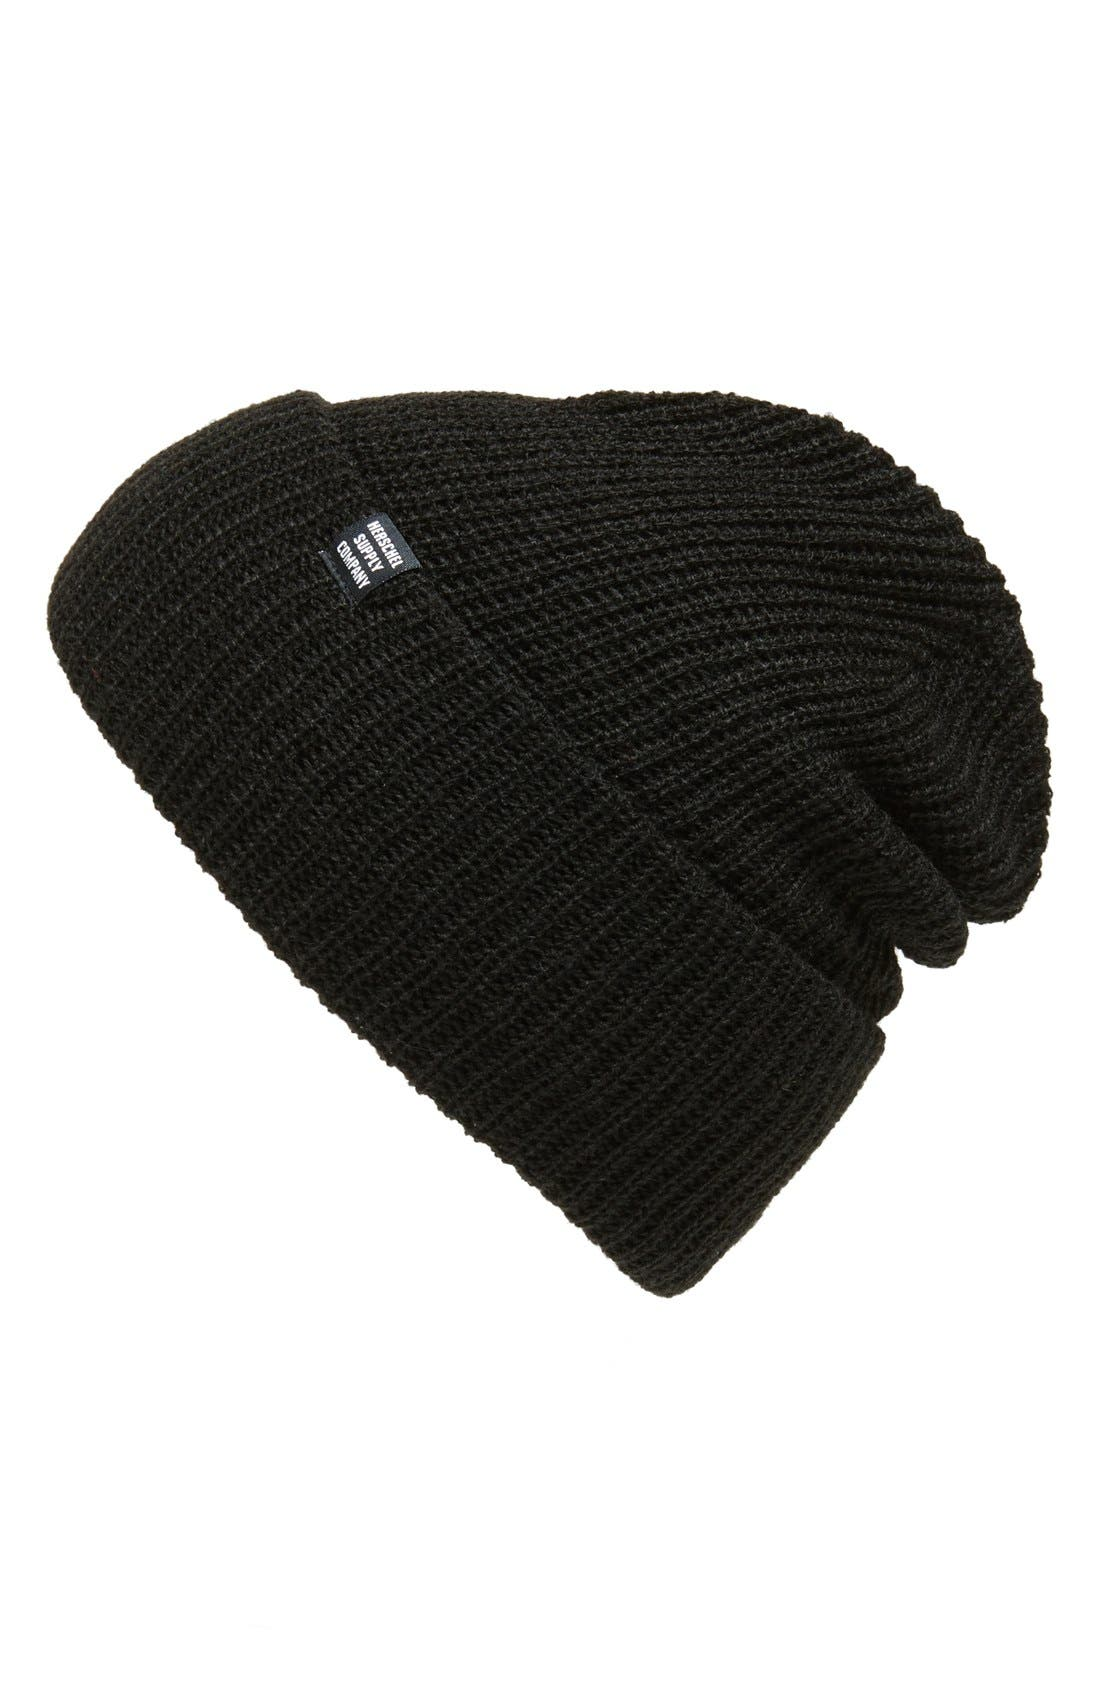 Alternate Image 1 Selected - Herschel Supply Co. 'Quartz' Solid Knit Cap